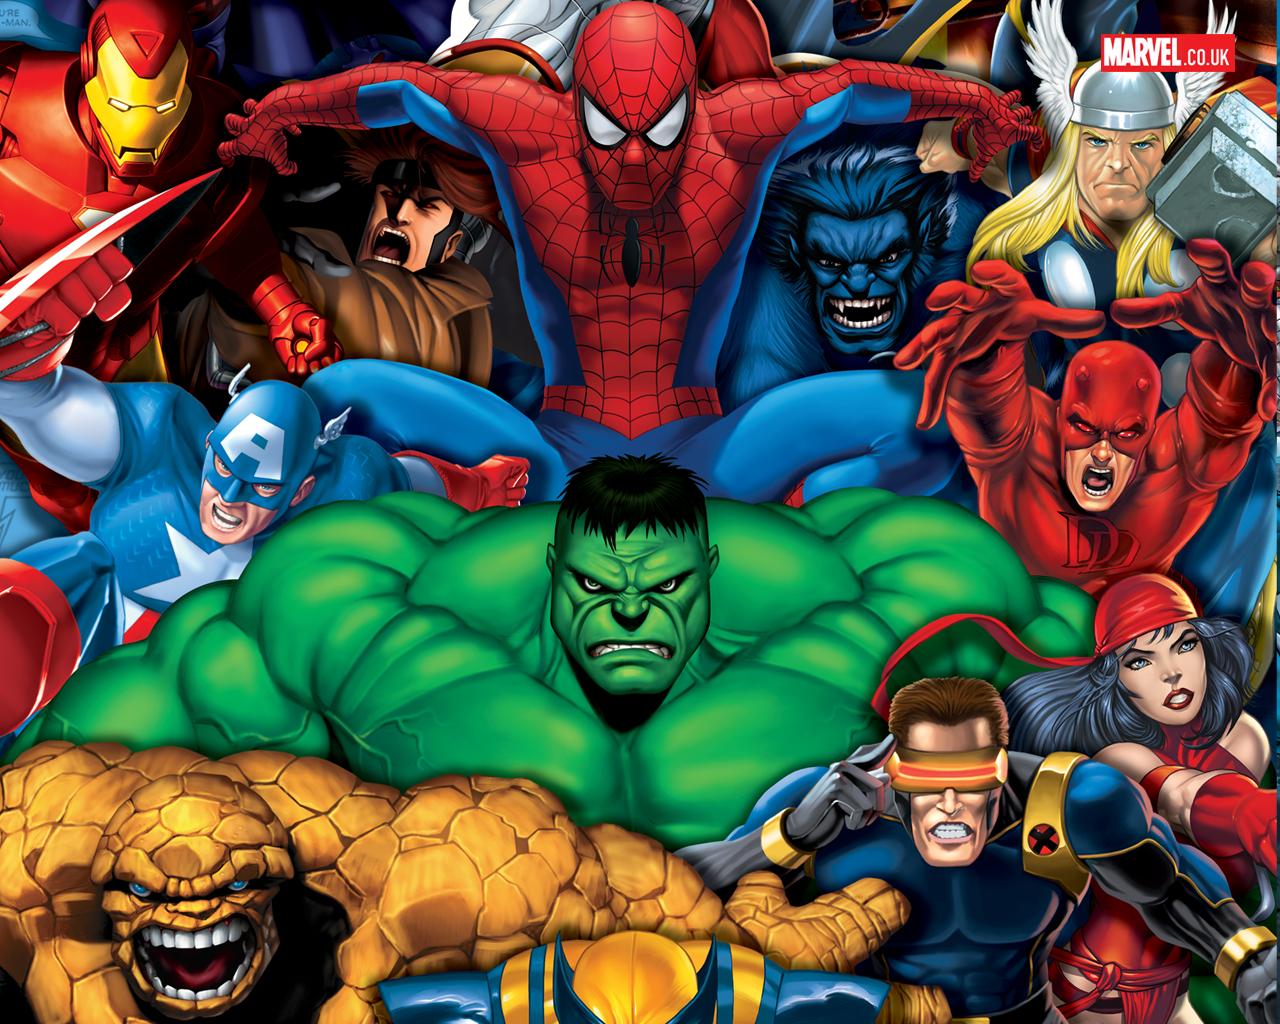 marvel 3d comics wallpaper marvel alternate universes wallpaper marvel 1280x1024